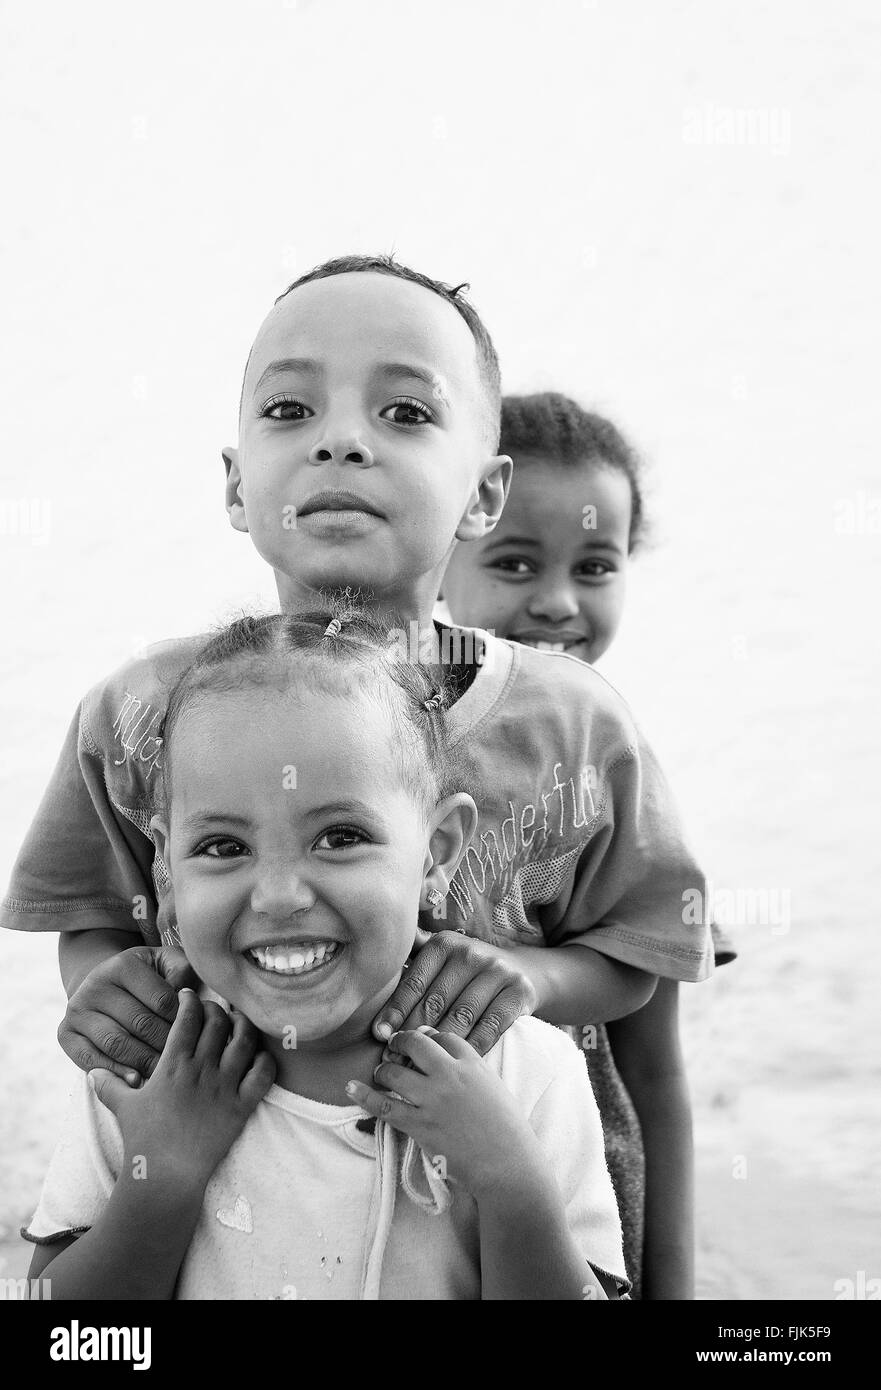 happy smiling ethiopian african kids in harar ethiopia near somalia border - Stock Image